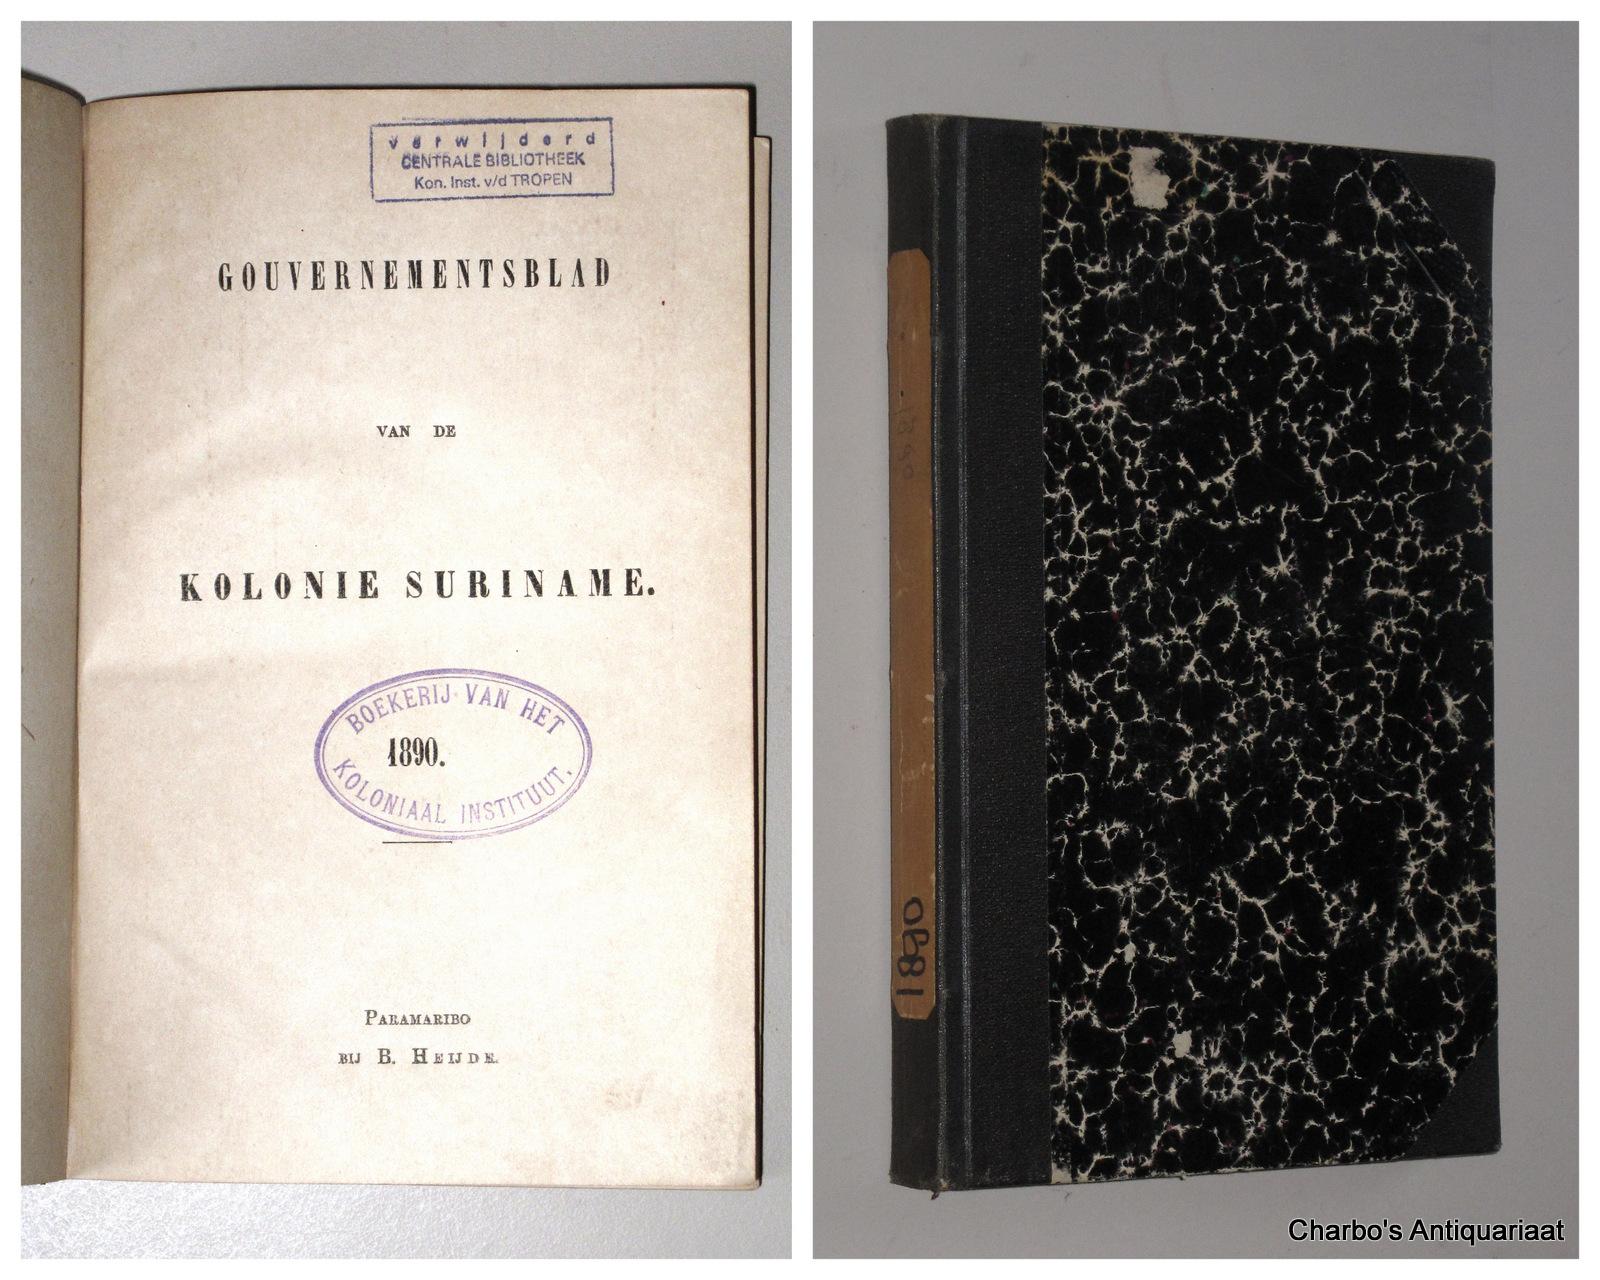 SURINAME. -  Gouvernementsblad der Kolonie Suriname voor het jaar 1890.